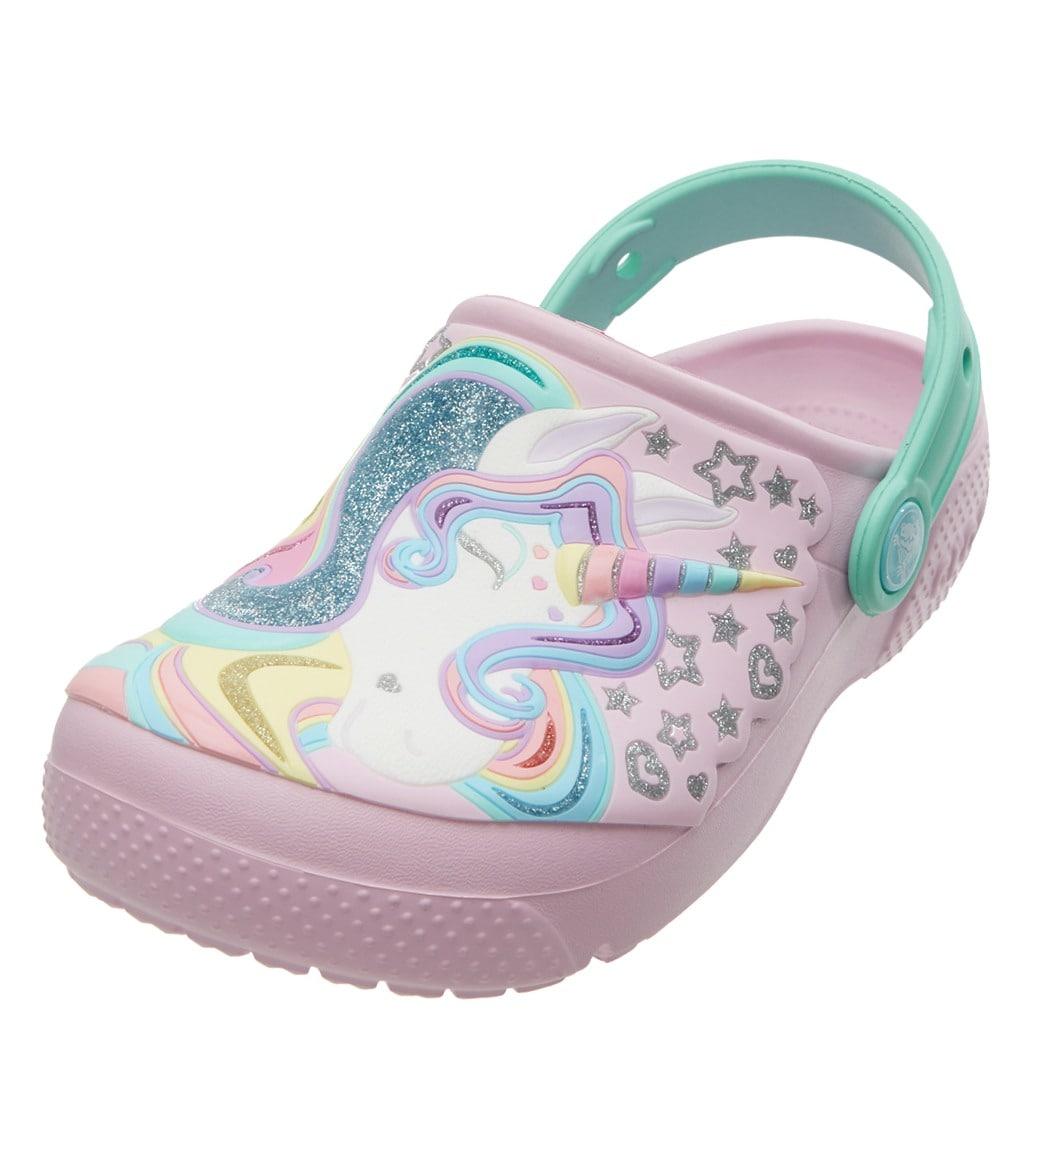 034f60b0e0feb4 Crocs Girls  Crocs Fun Lab Clog (Toddler